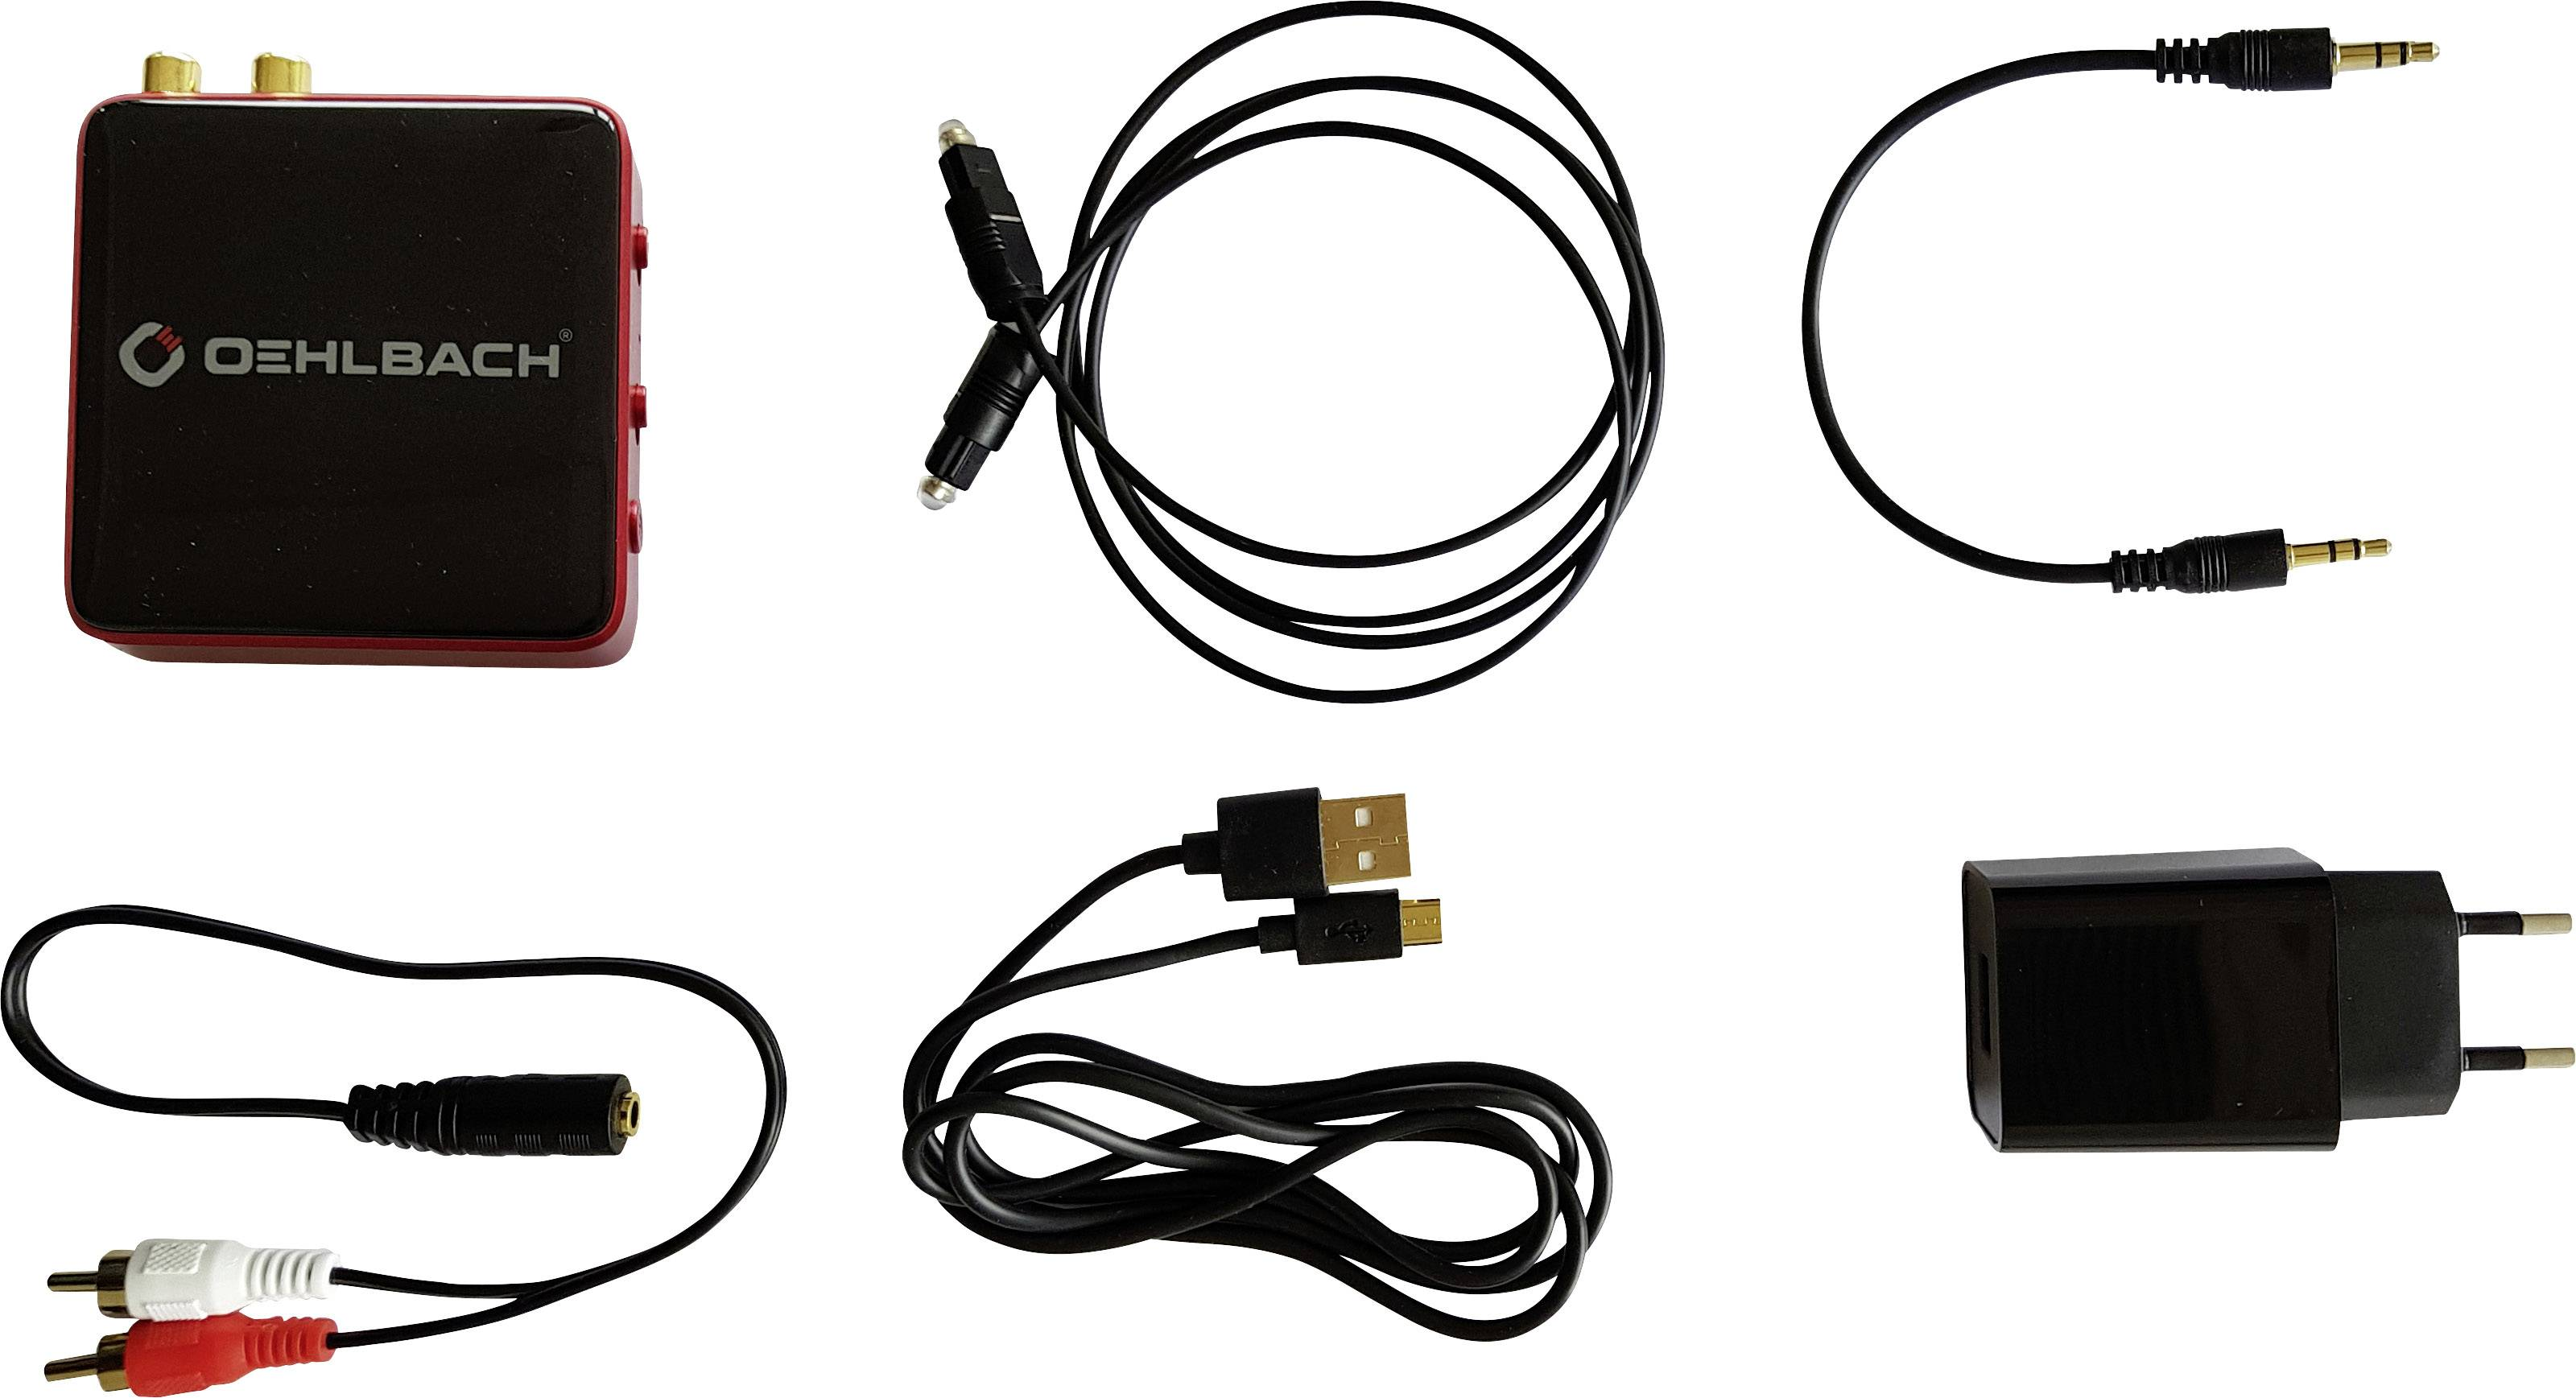 Oehlbach BTR Evolution 5.0 Bluetooth® glasbeni oddajnik/sprejemnik Bluetooth: 5.0 10 m aptx-tehnologija